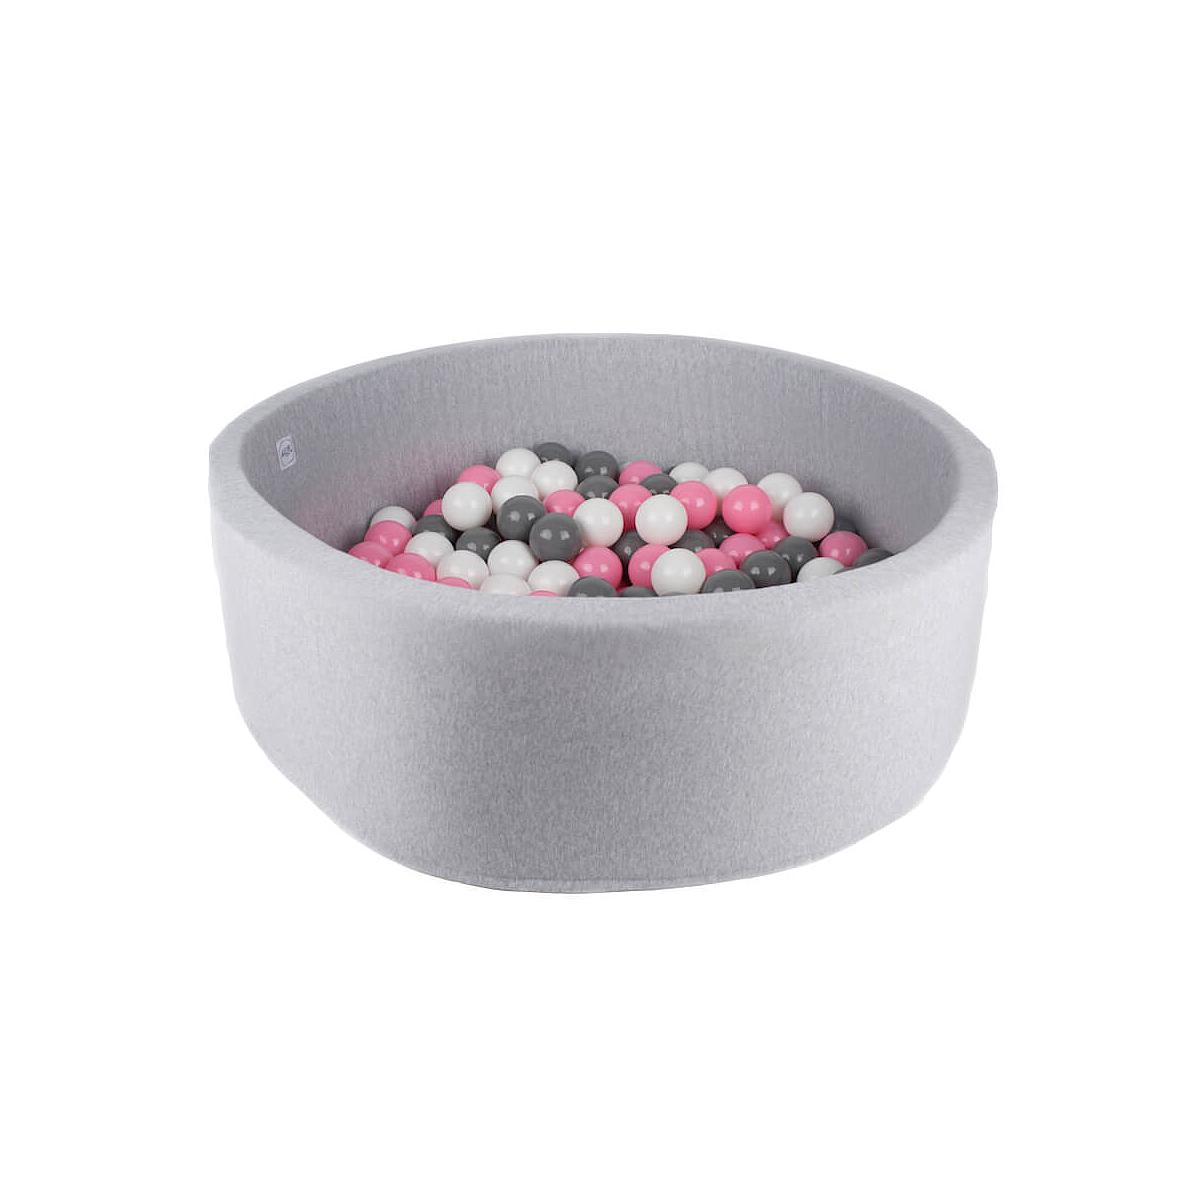 Piscine 200 boules LIGHT GREY Minibe powder pink-gris-blanc